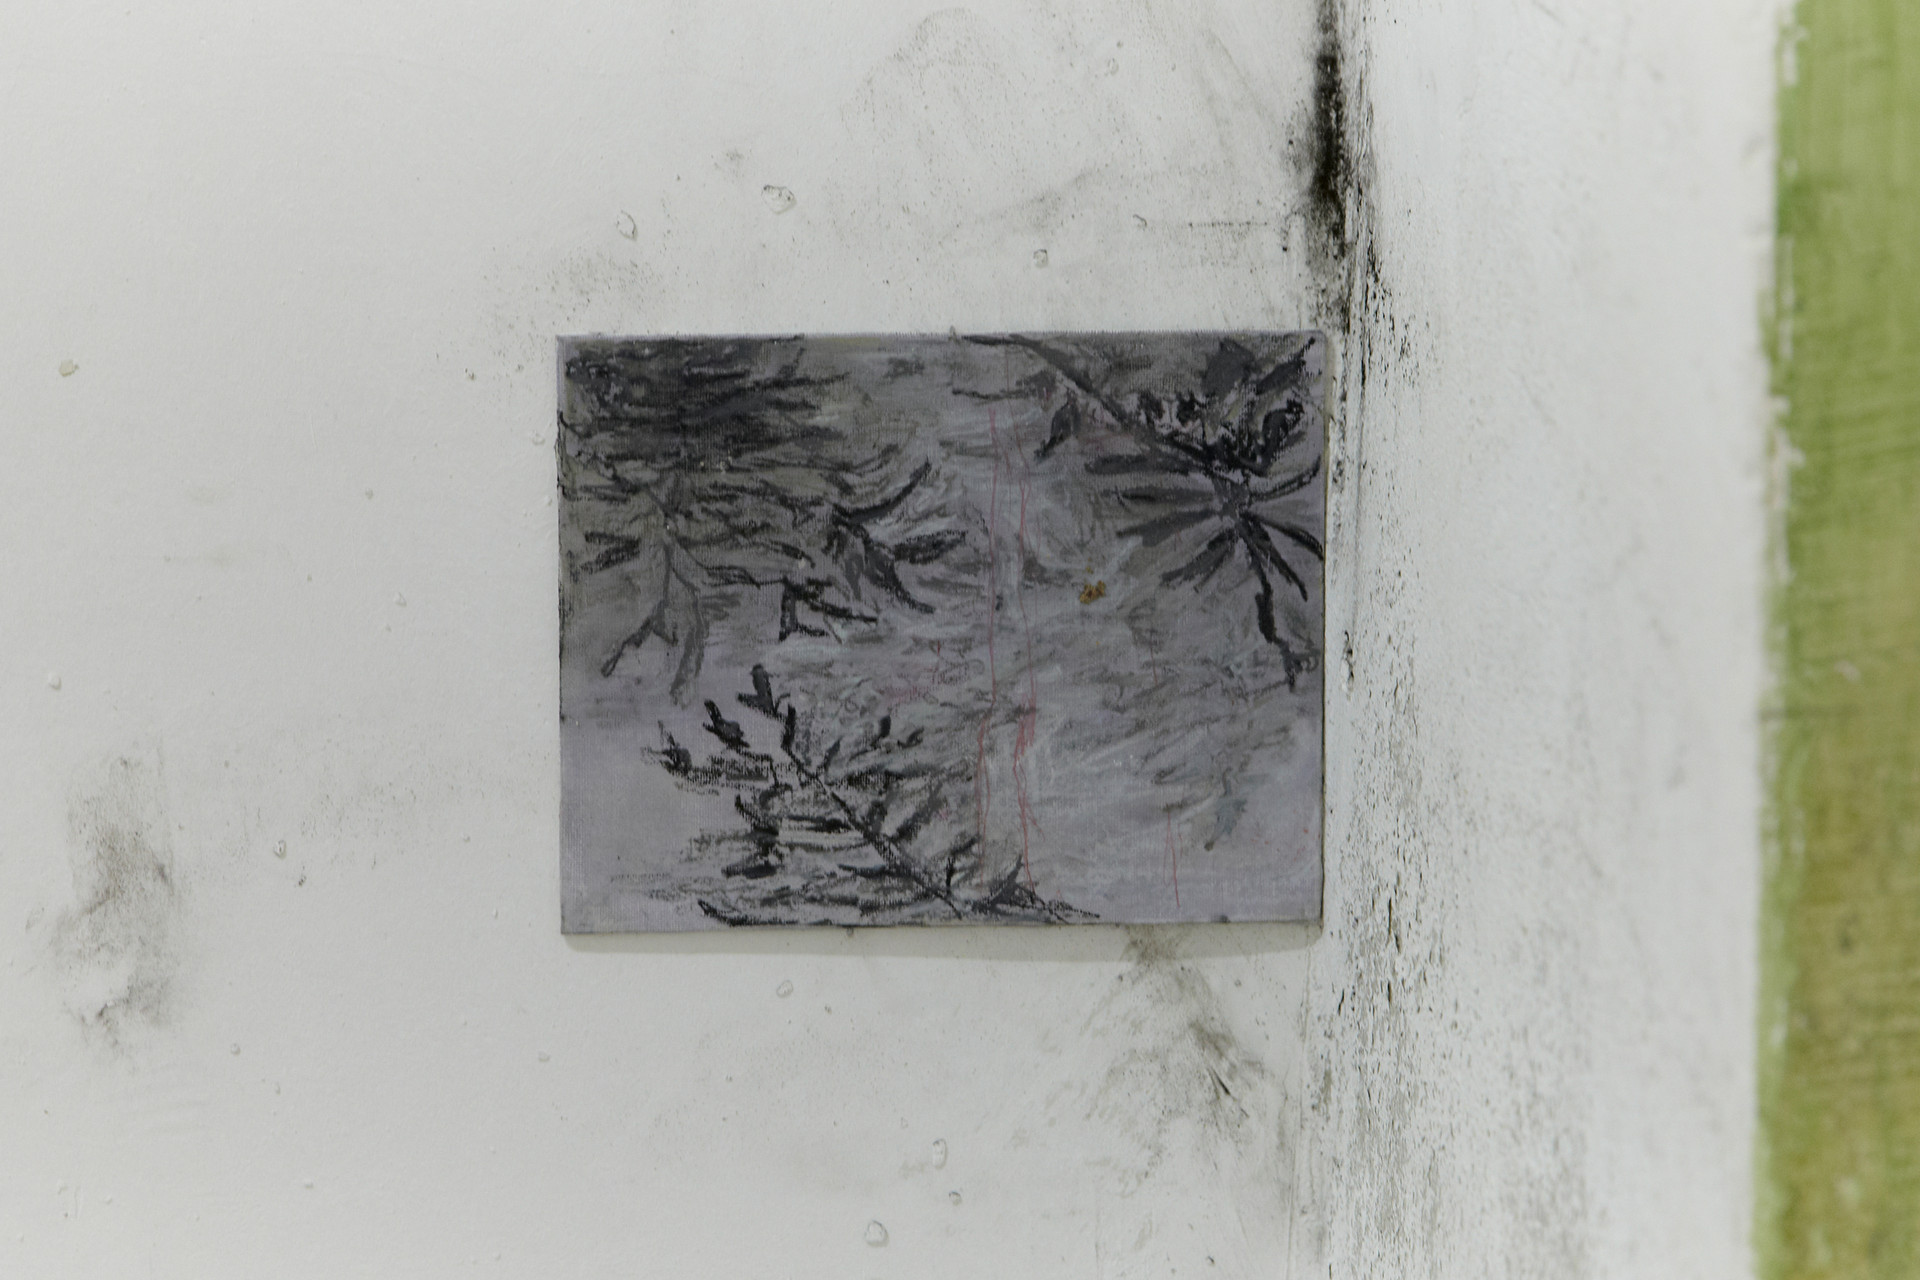 Storm, 25 x 20 cm, oil on canvas, 2018